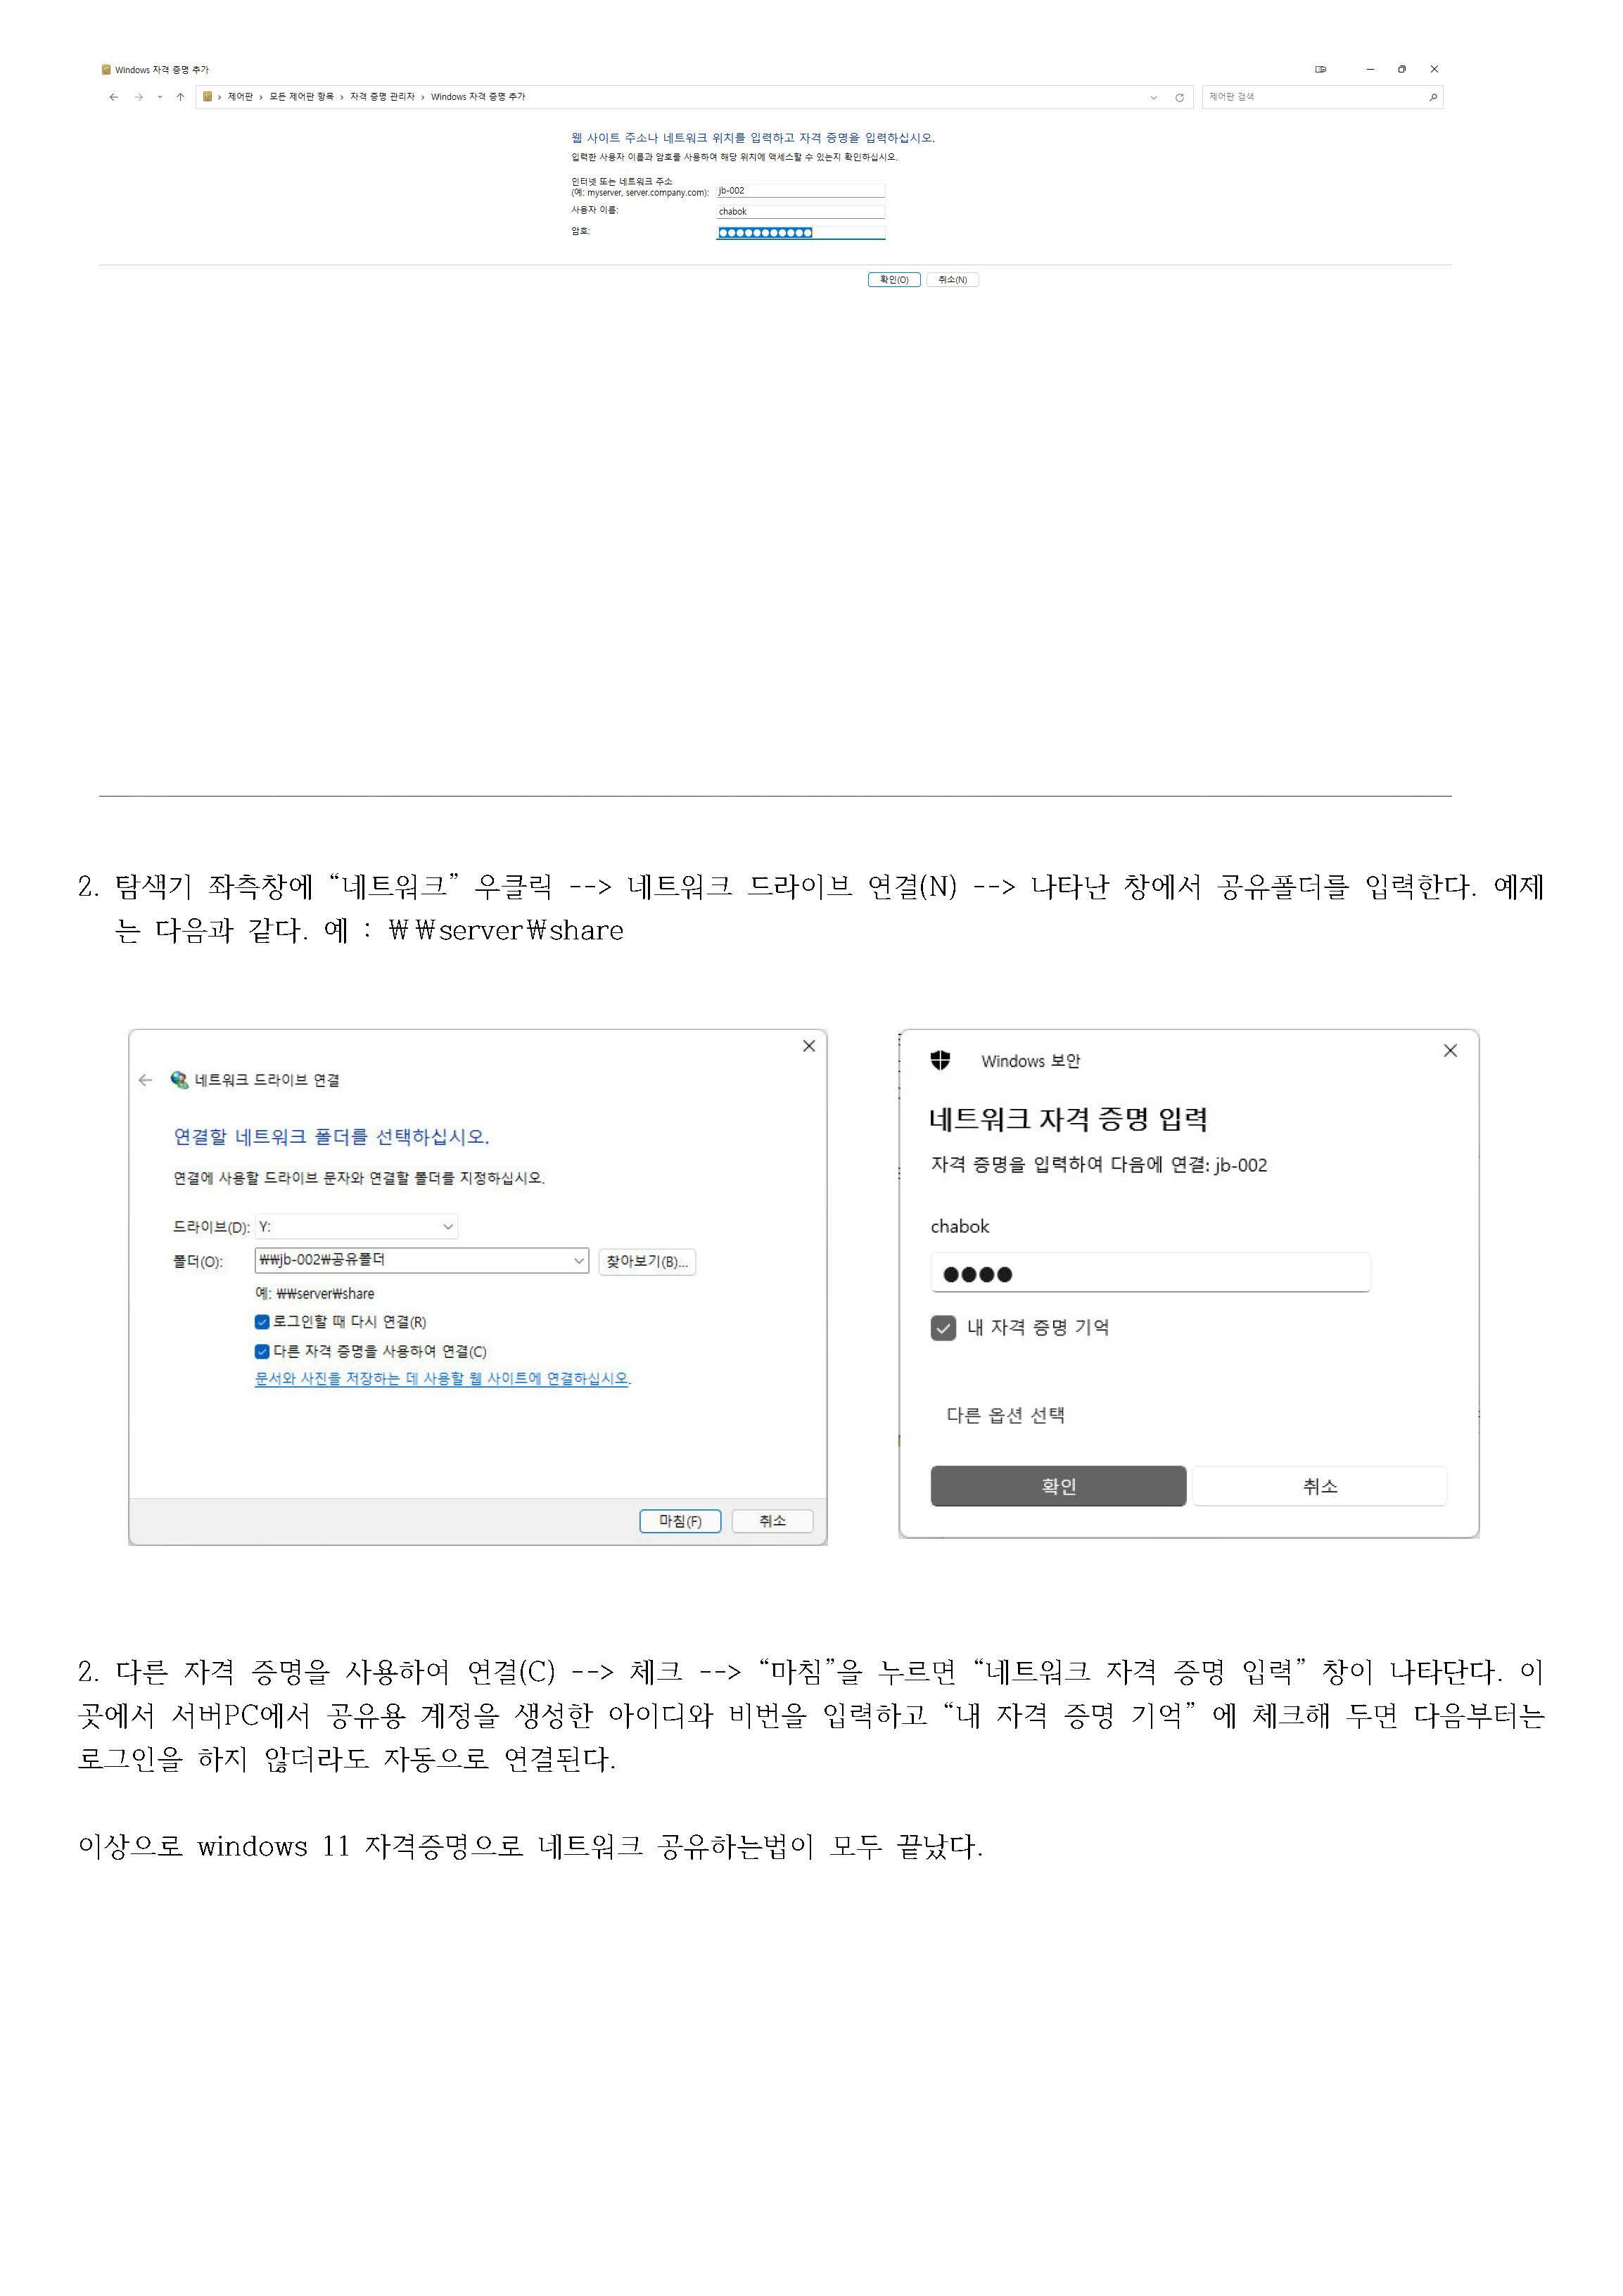 windows 11 자격증명으로 네트워크 공유하는법_페이지_4.jpg